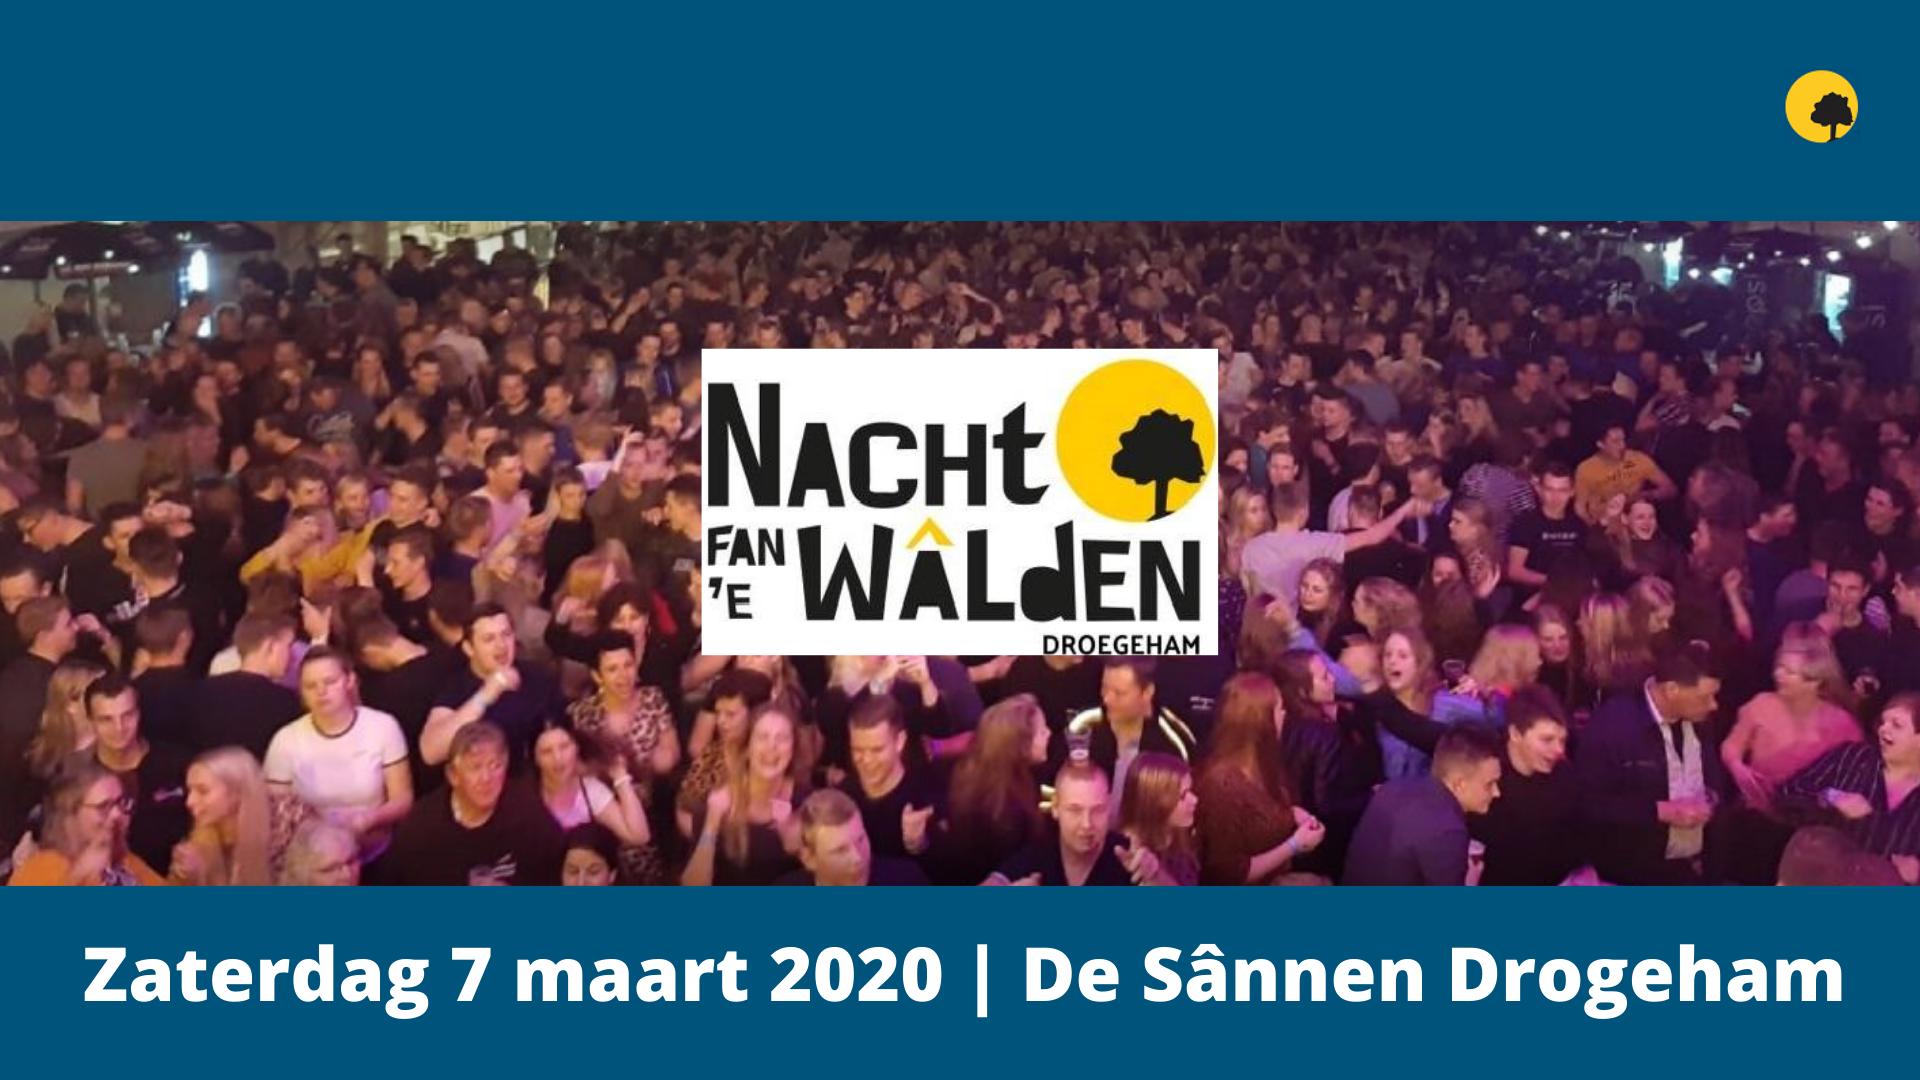 Nacht Fan De Walden Zaterdag 7 maart 2020 | De Sannen Drogeham | Website | Header